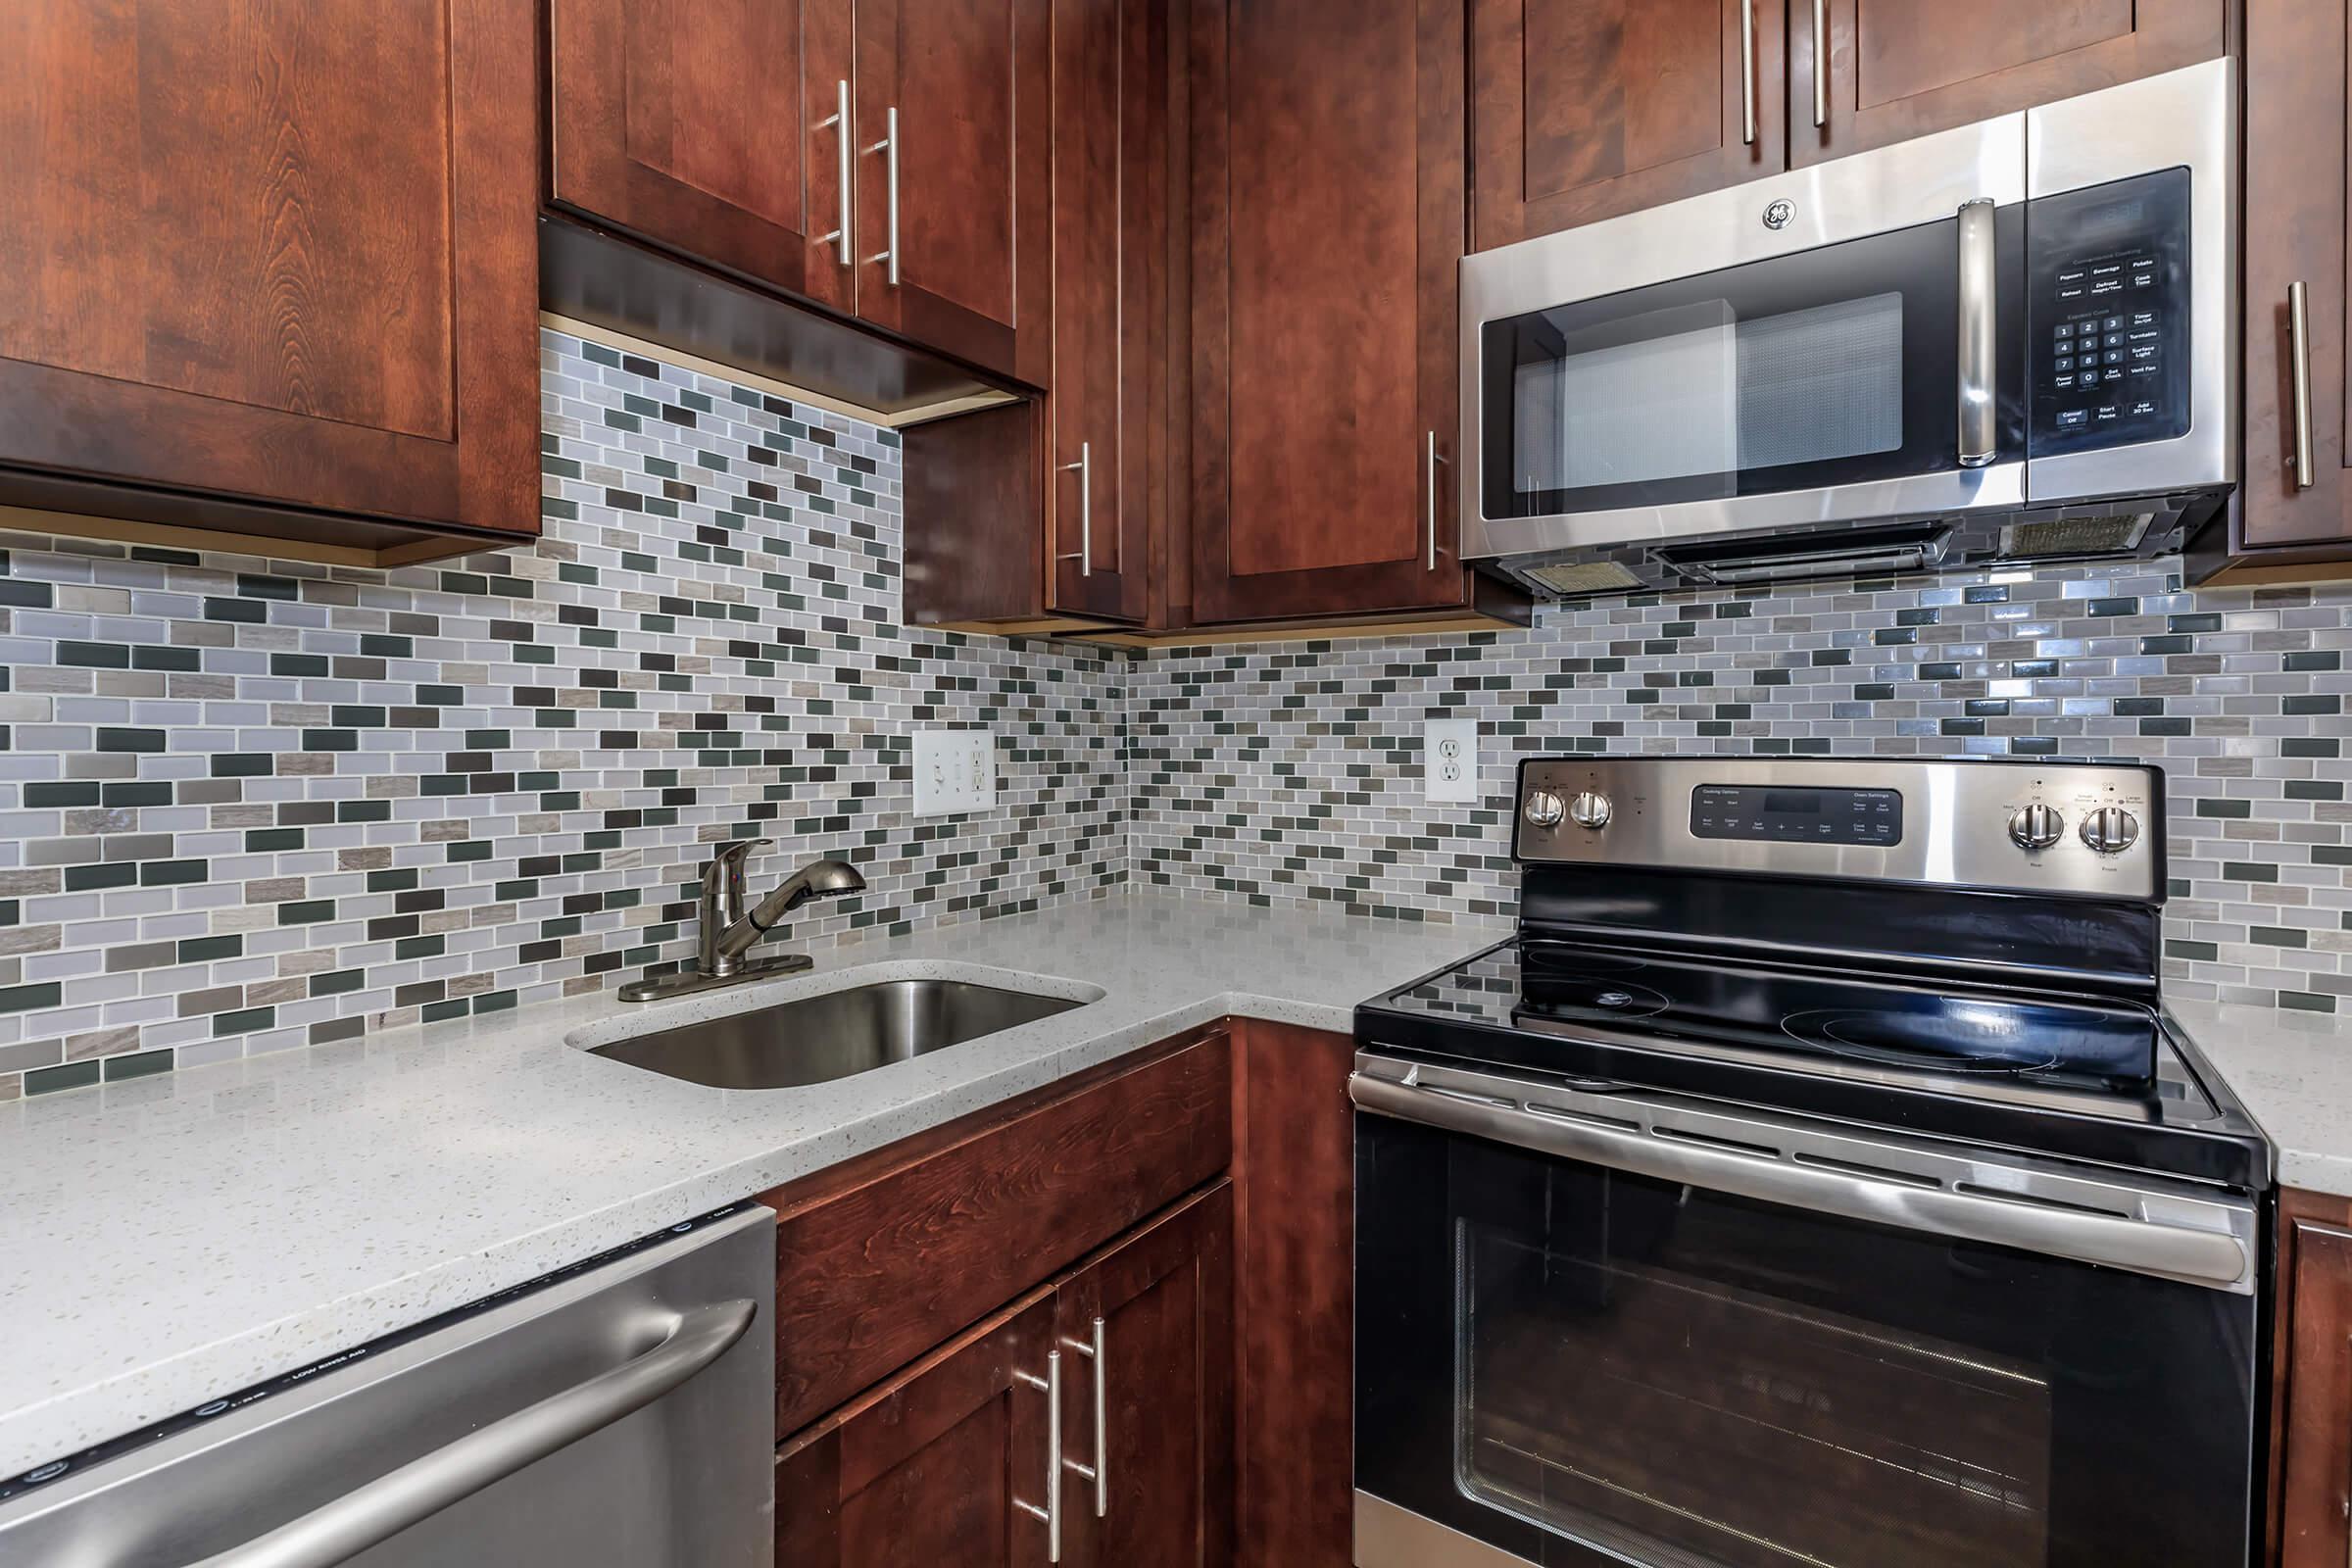 Kitchen at Whitestoneat Landmark in Alexandria VA